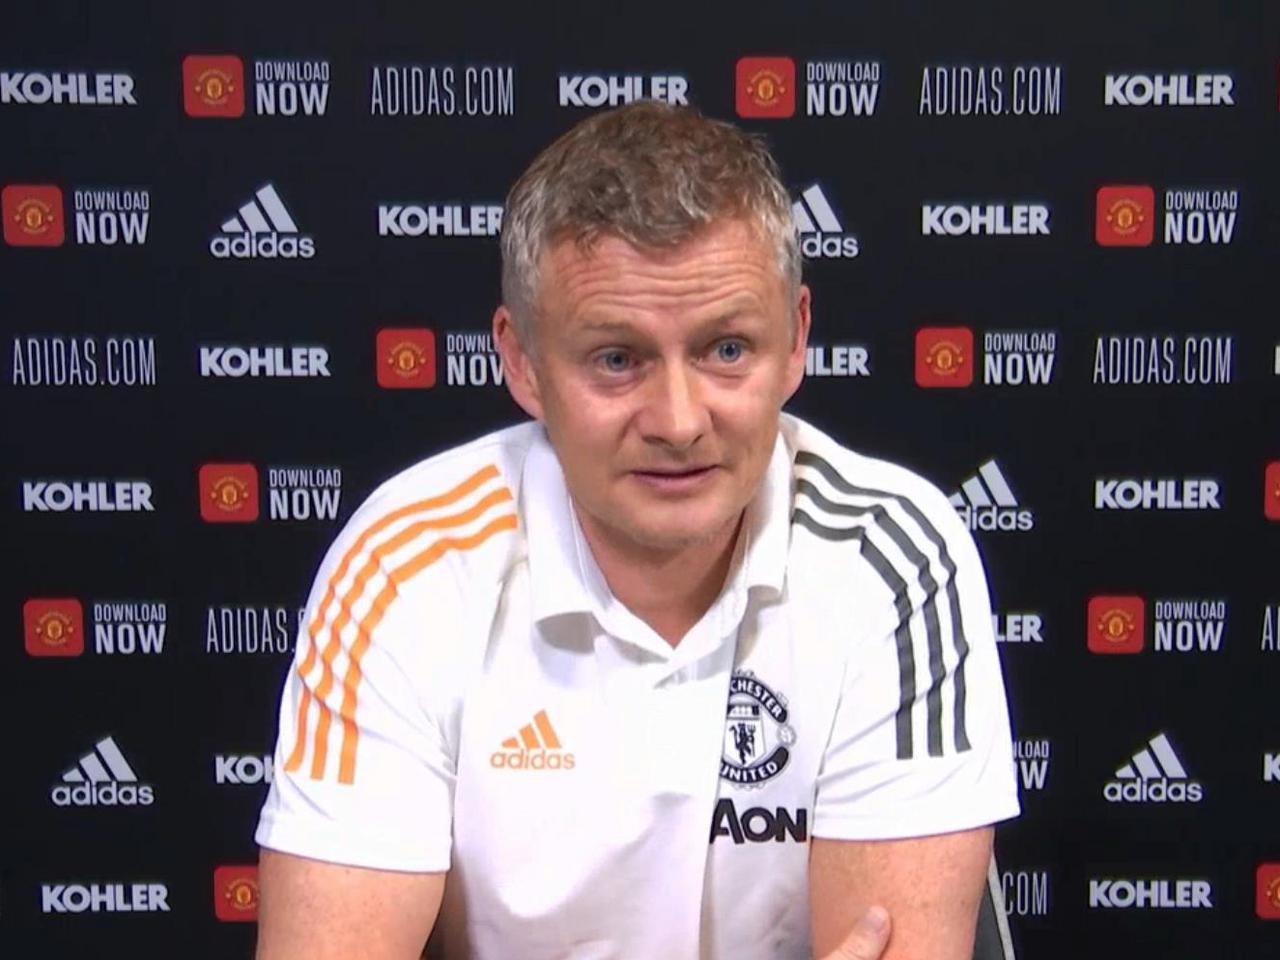 منچستریونایتد / لیگ برتر / انگلیس / نروژ / Norway / Premier League / Manchester United